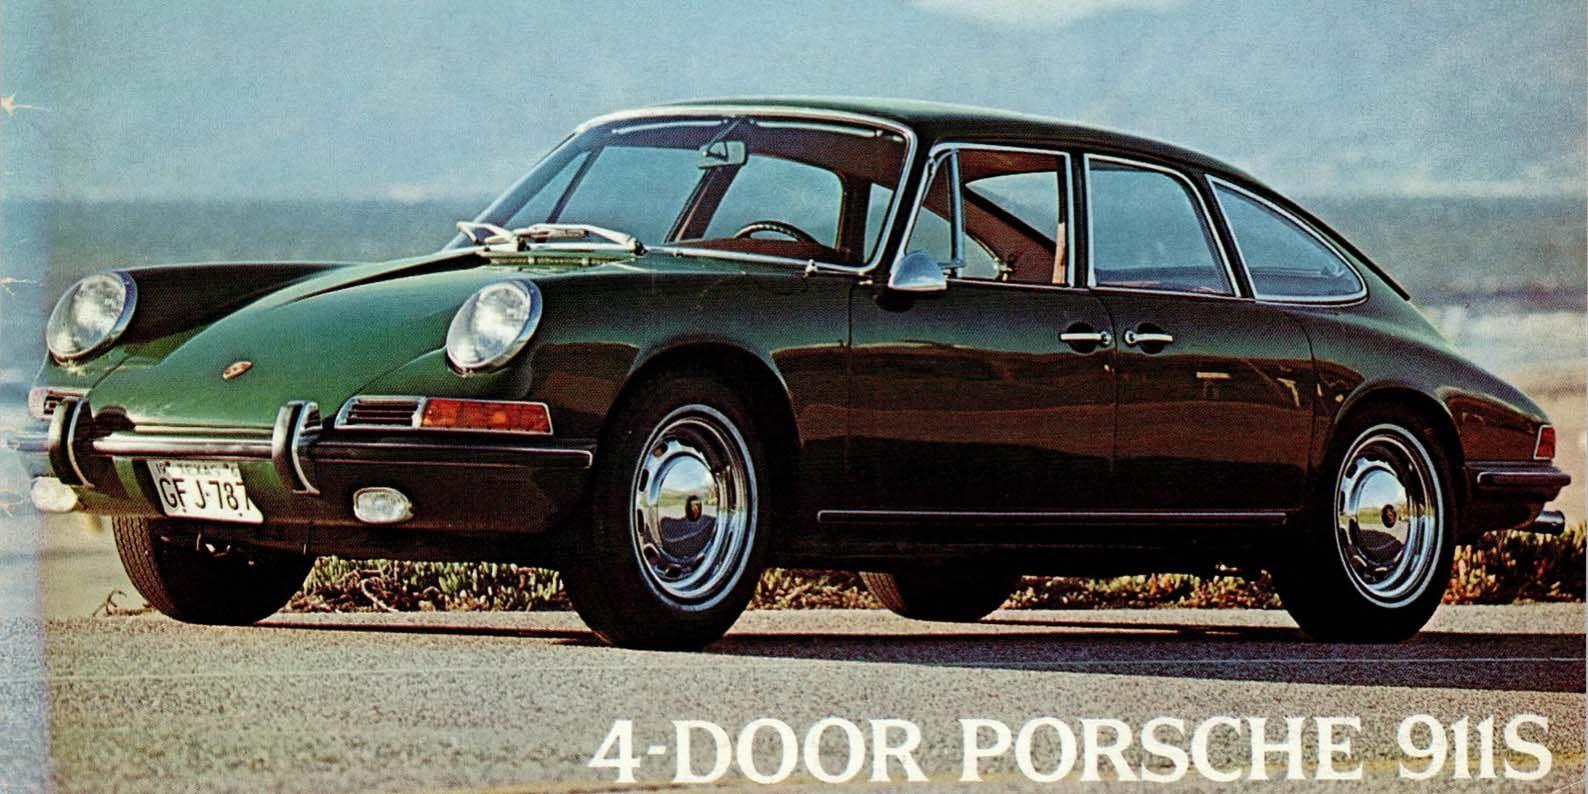 the strange and wonderful tale of the 4 door porsche 911